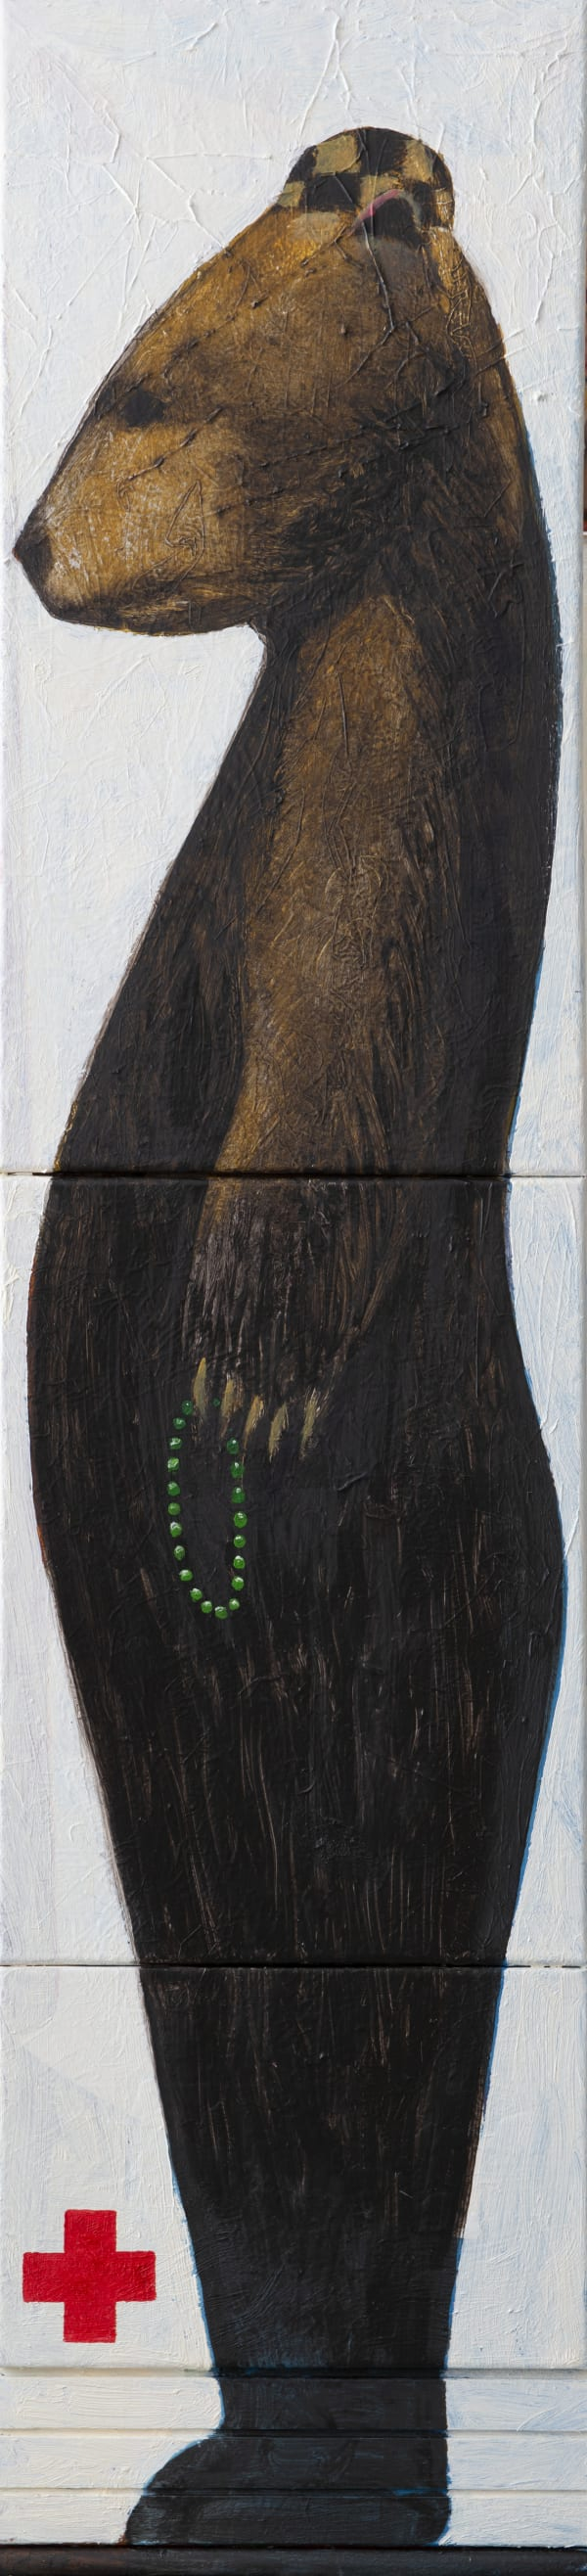 Derek Cowie, Exponential Bear (Now), 2020